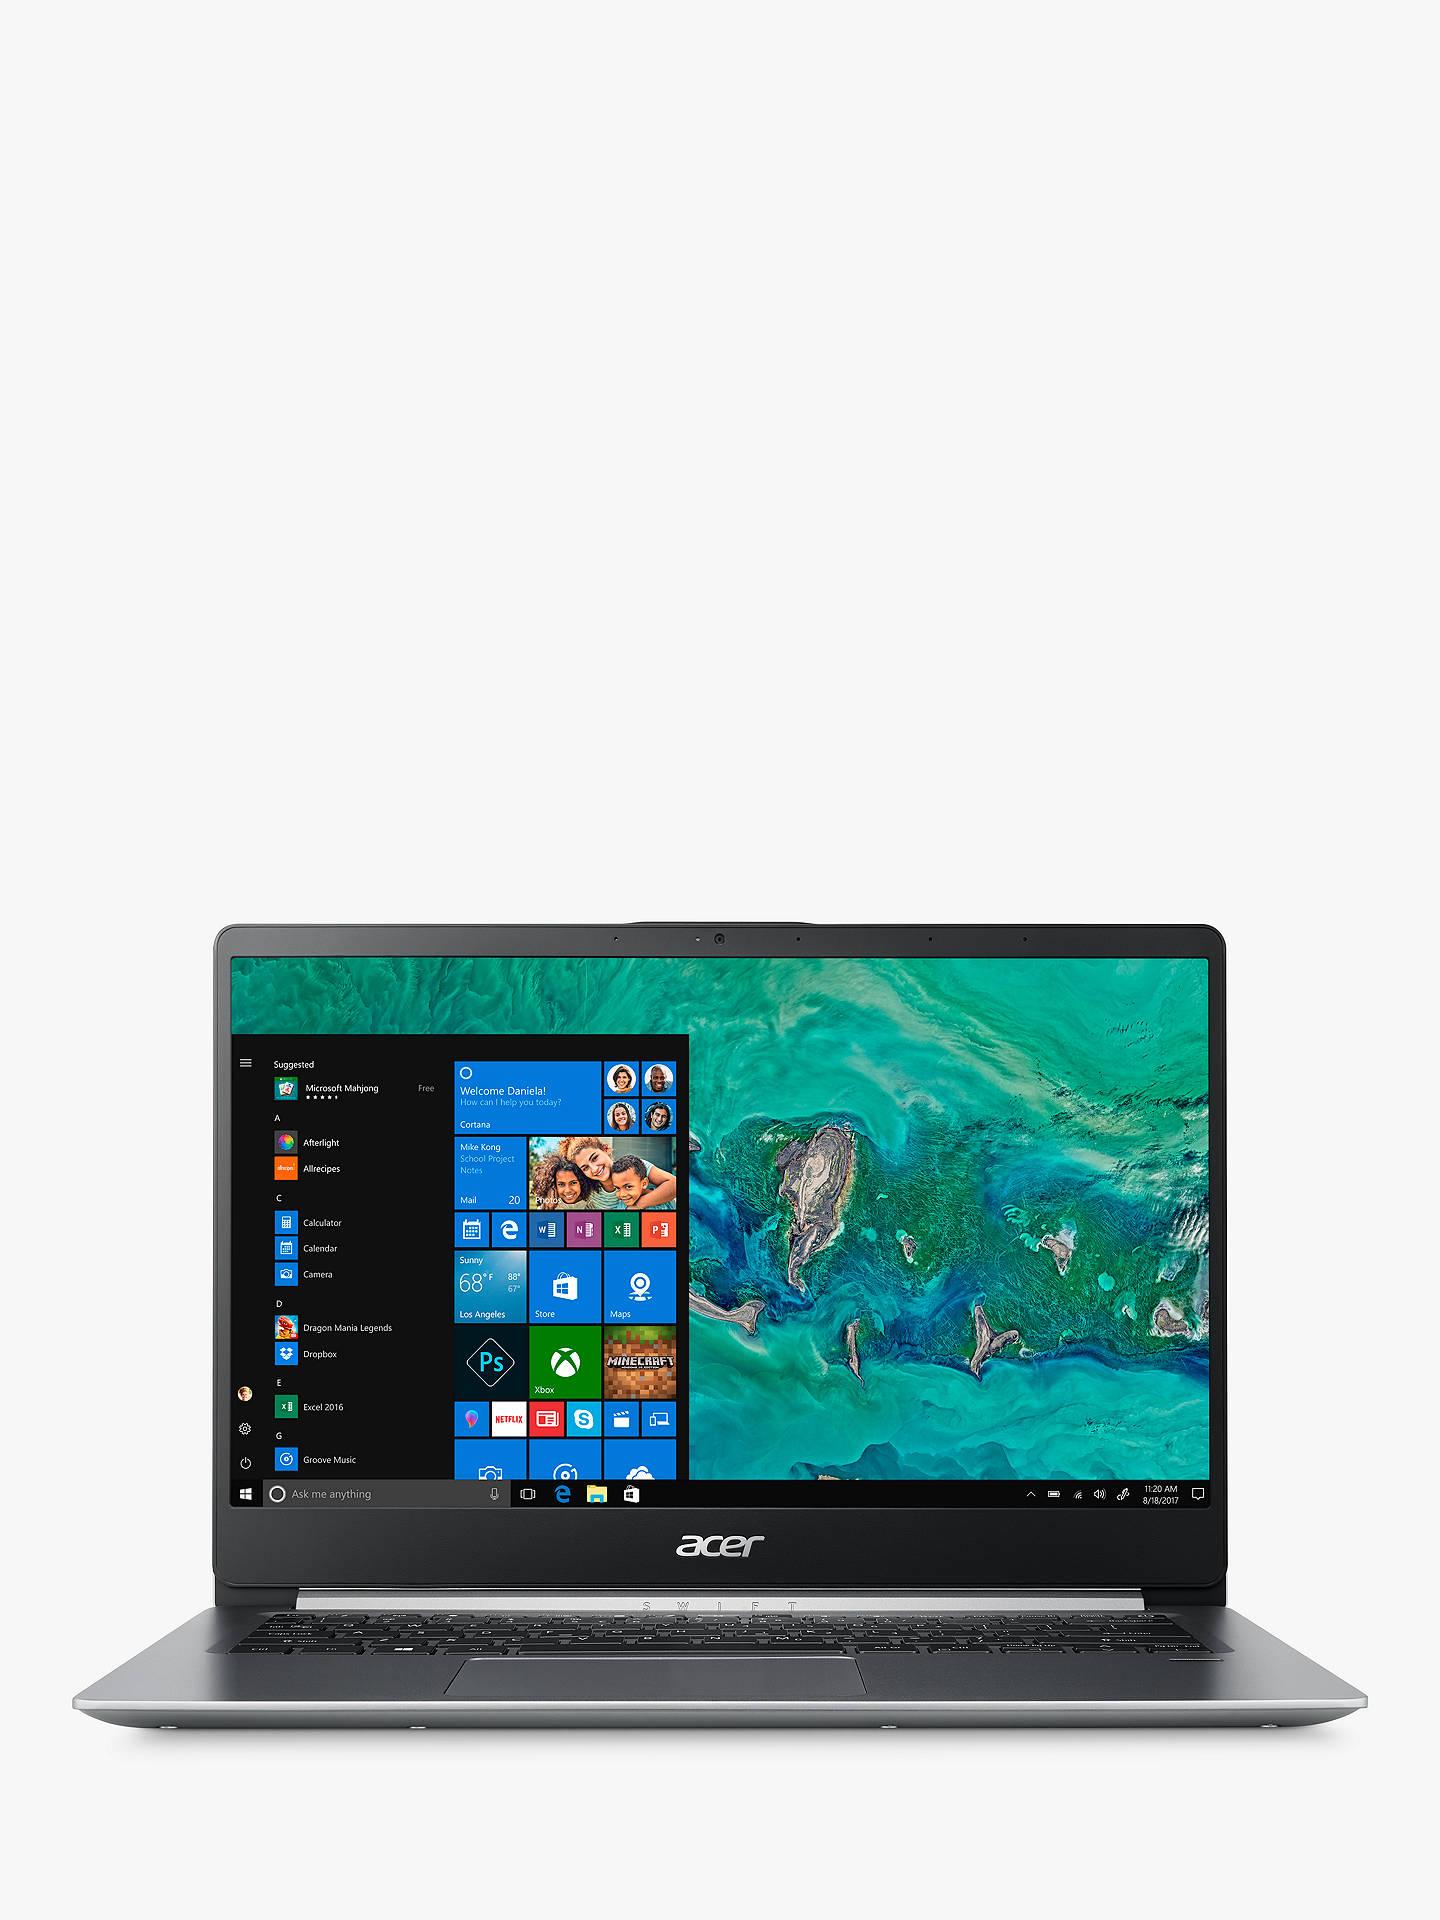 Acer Swift 1 SF114-32 Laptop, Intel Pentium Processor, 4GB RAM, 128GB SSD,  Silver